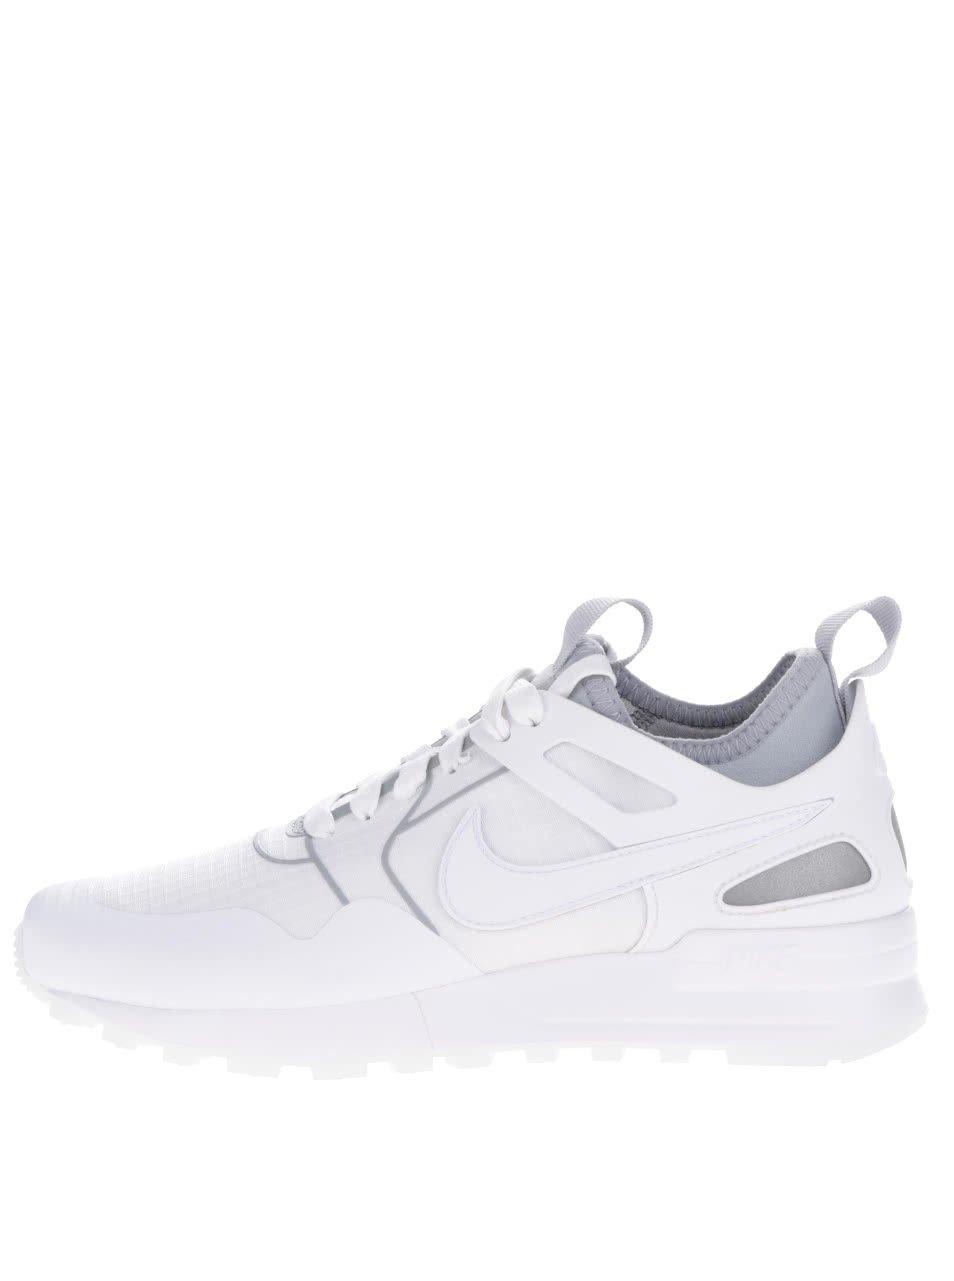 Šedo-bílé dámské tenisky Nike Air Pegasus